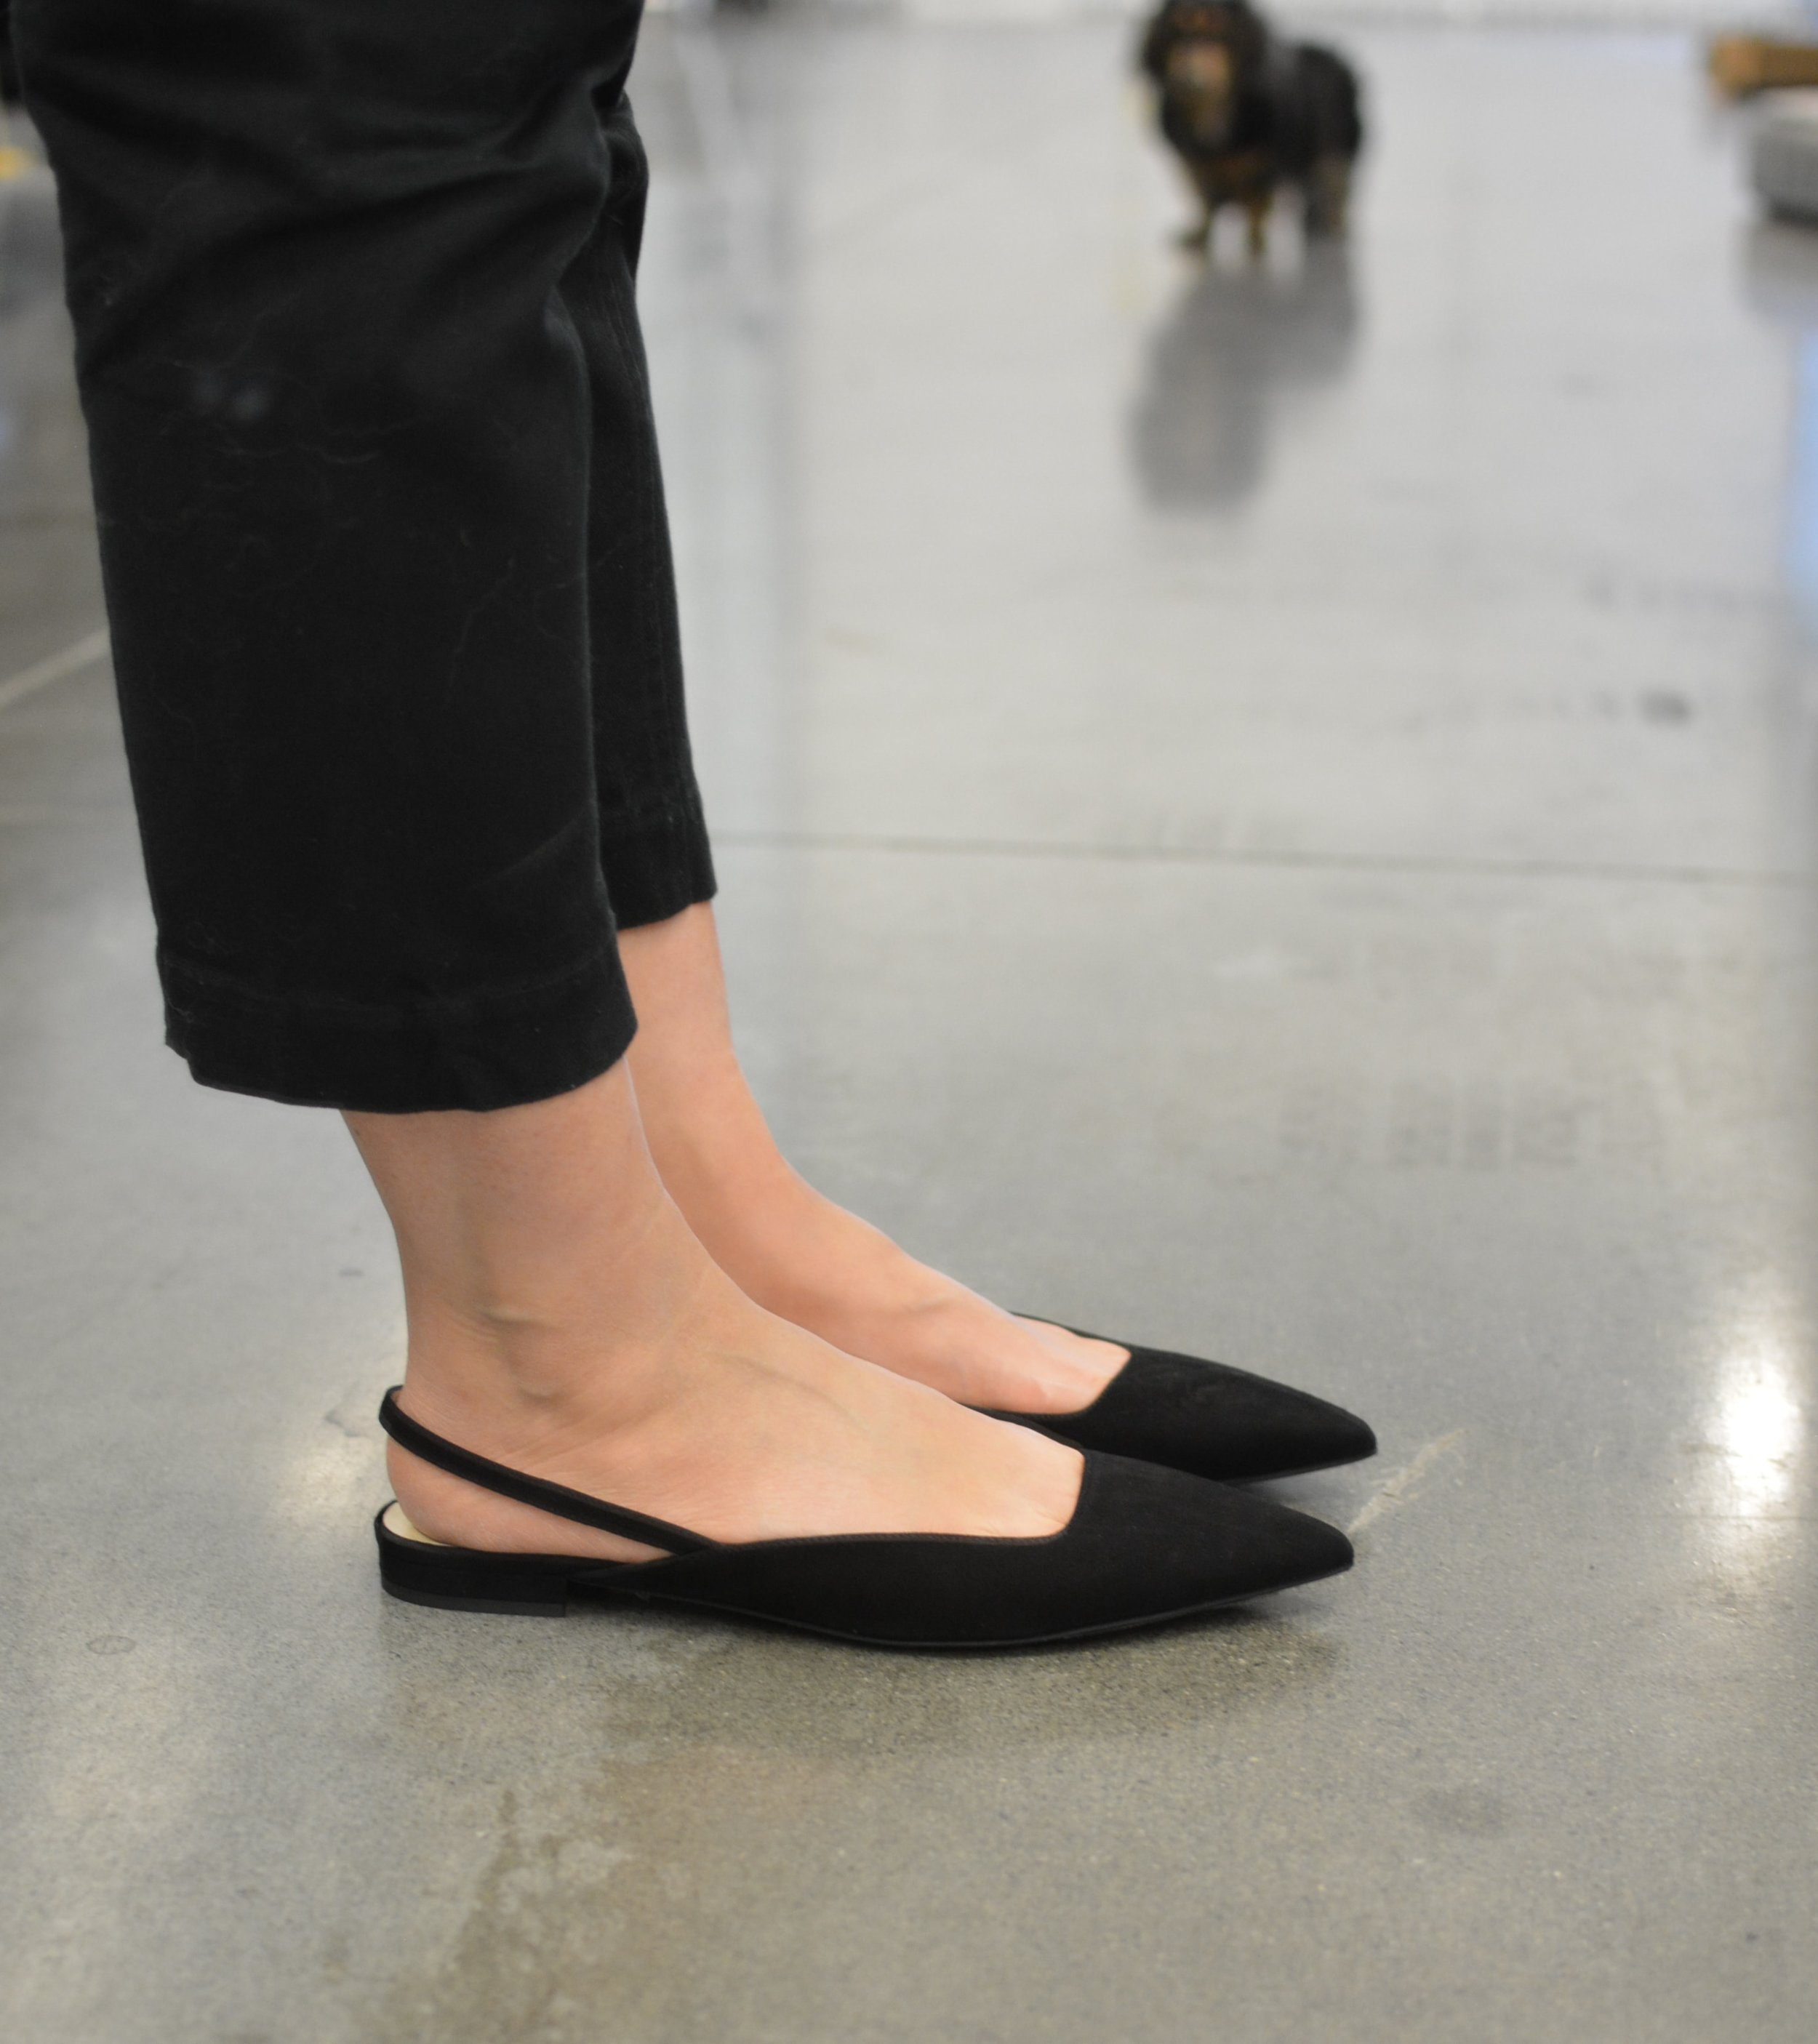 Everlane Review The Editor Slingback shoe (1 of 2)-min.jpg